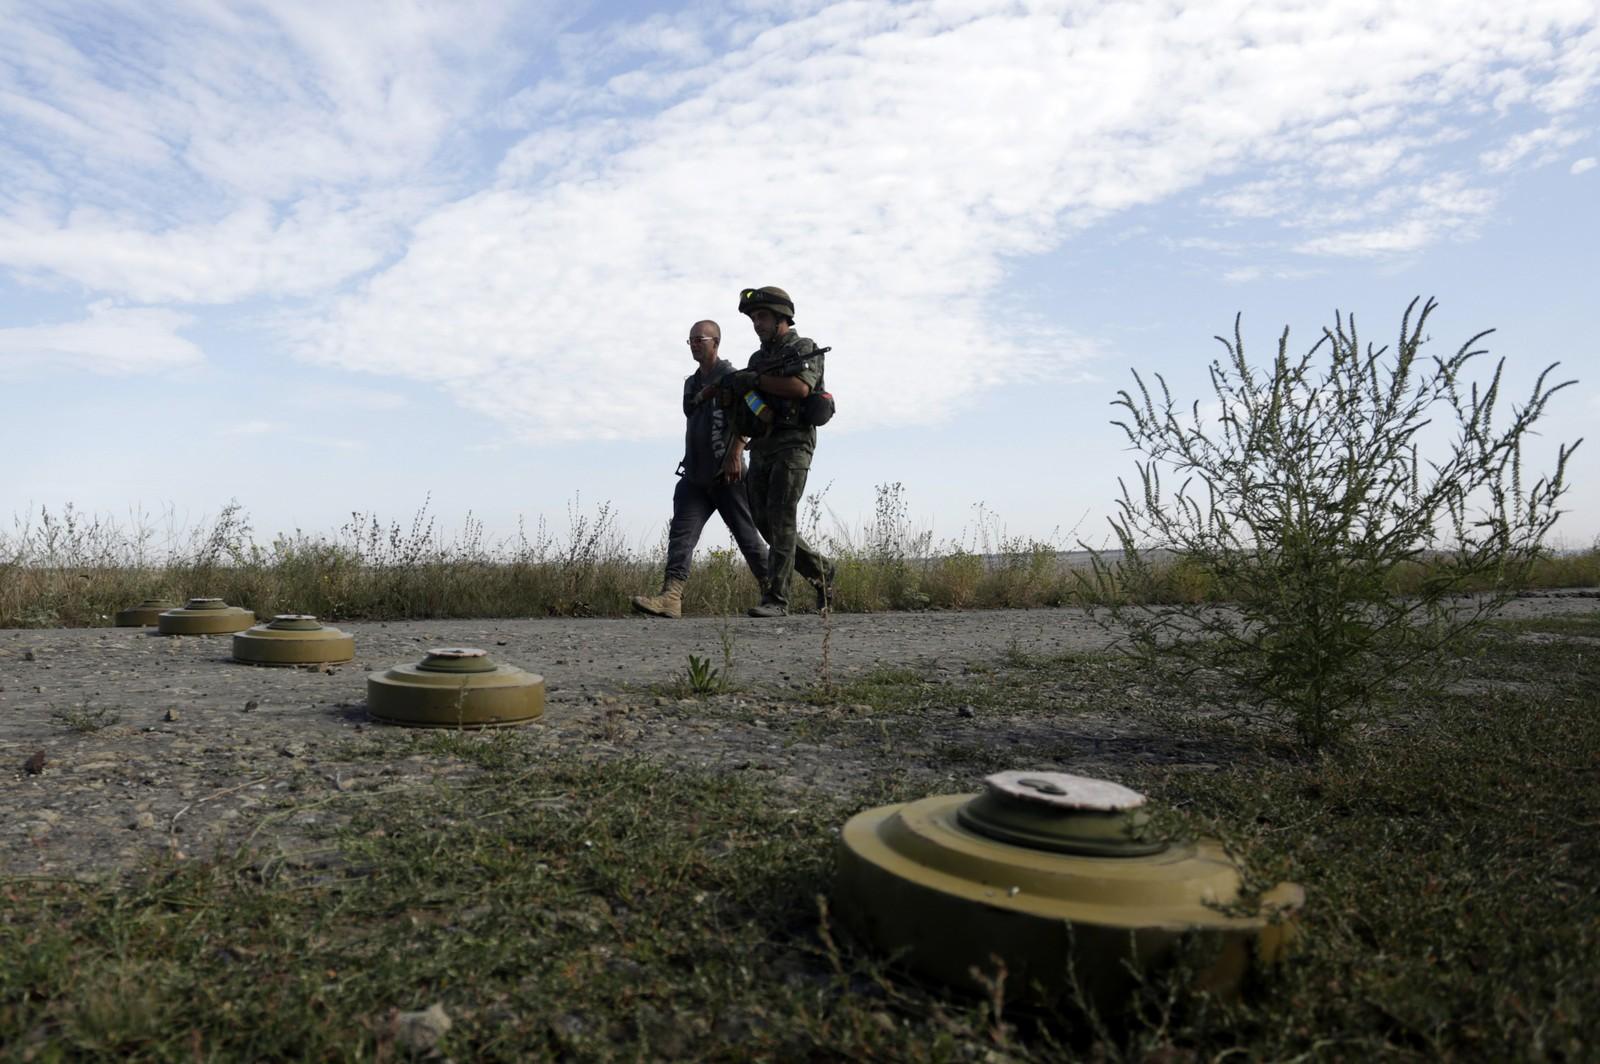 Nye samtaler mellom Ukraina, Russland og EU fant sted i Brüssel denne uka. Kamper mellom pro-russiske og ukrainske regjeringsstyrker tok seg opp denne uka. Dette bildet viser miner i regionen Lugansk.